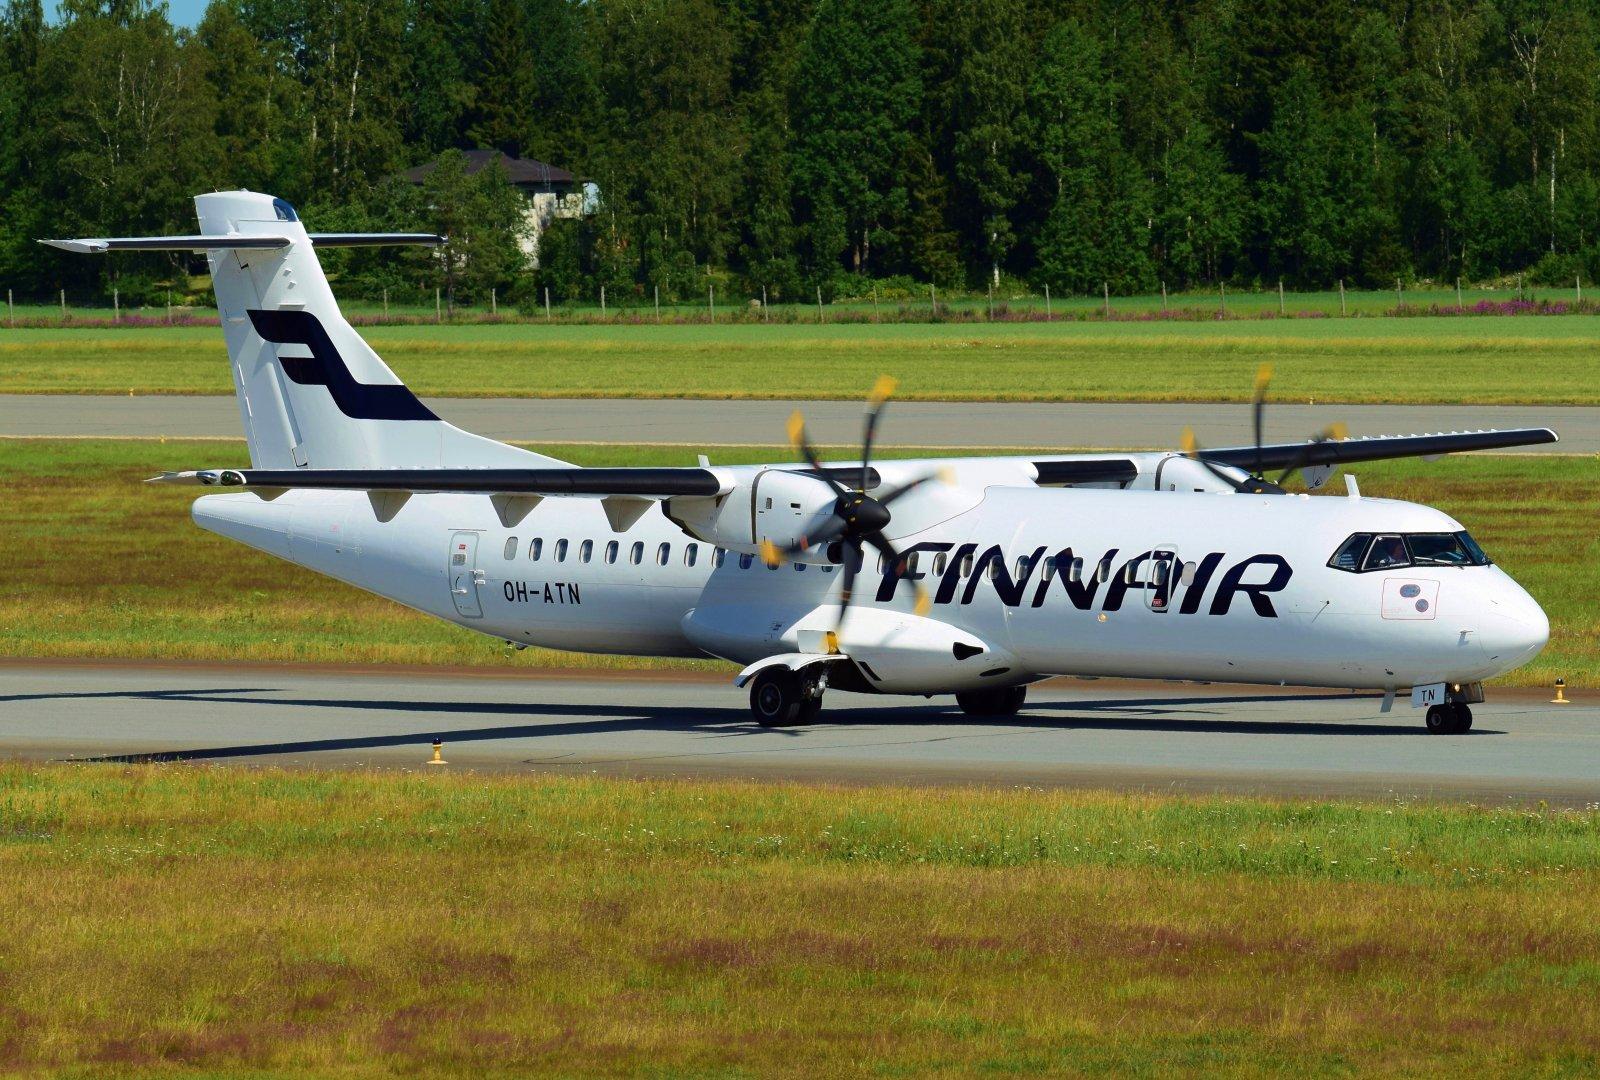 OH-ATN - ATR 72-500 - Finnair - 2.7.2020